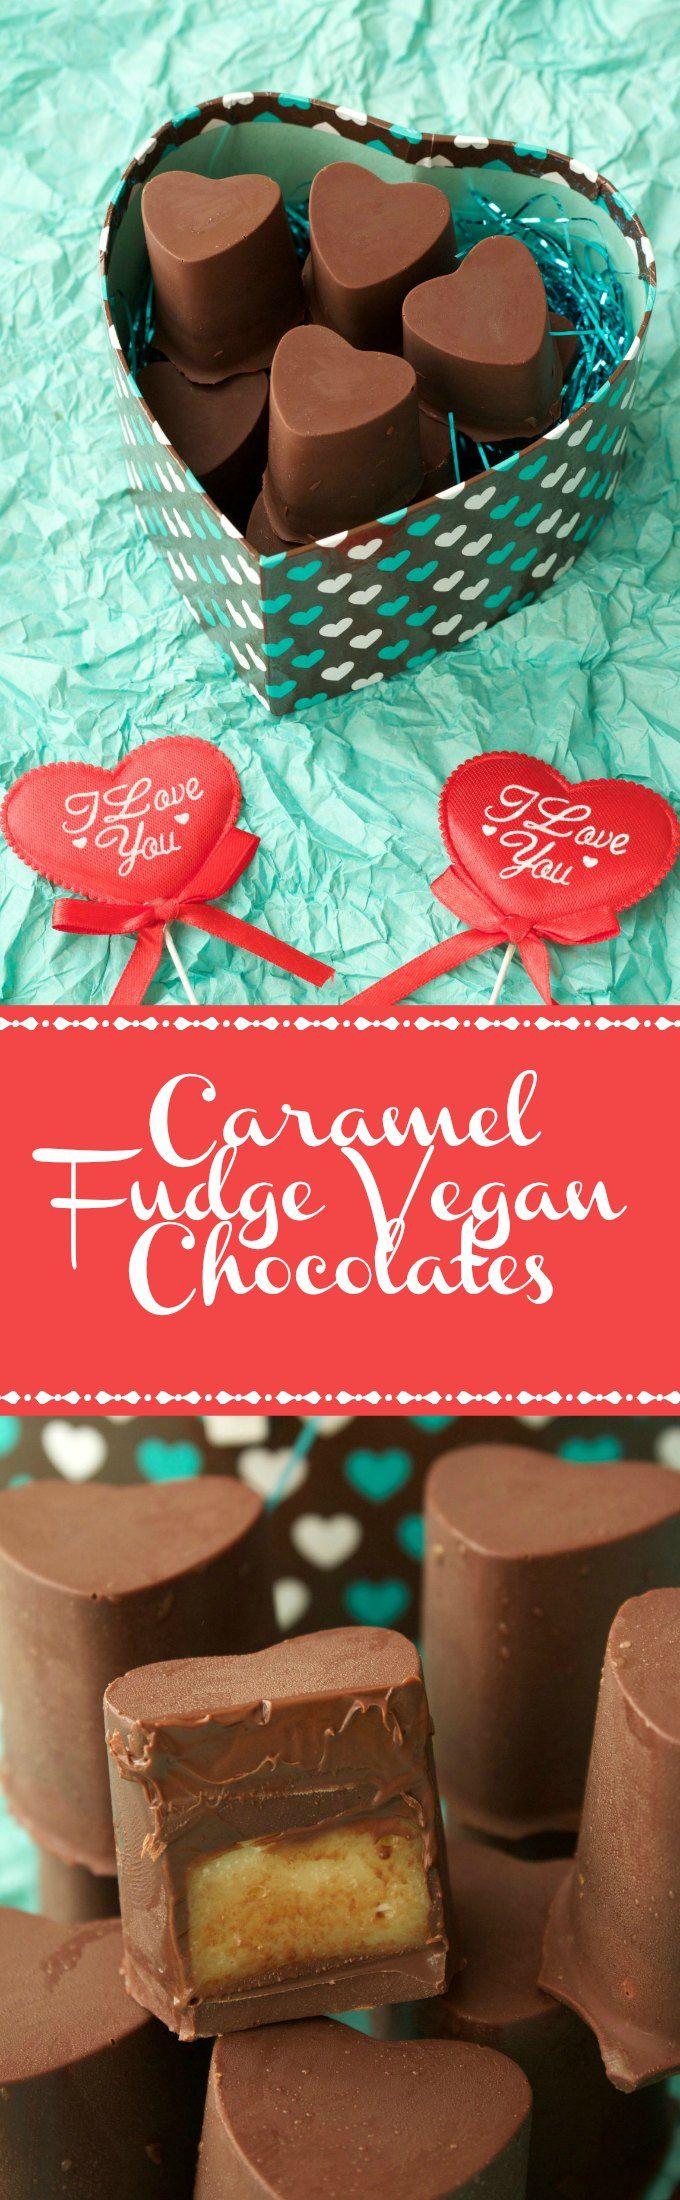 Caramel Fudge Vegan Chocolates | Loving It Vegan